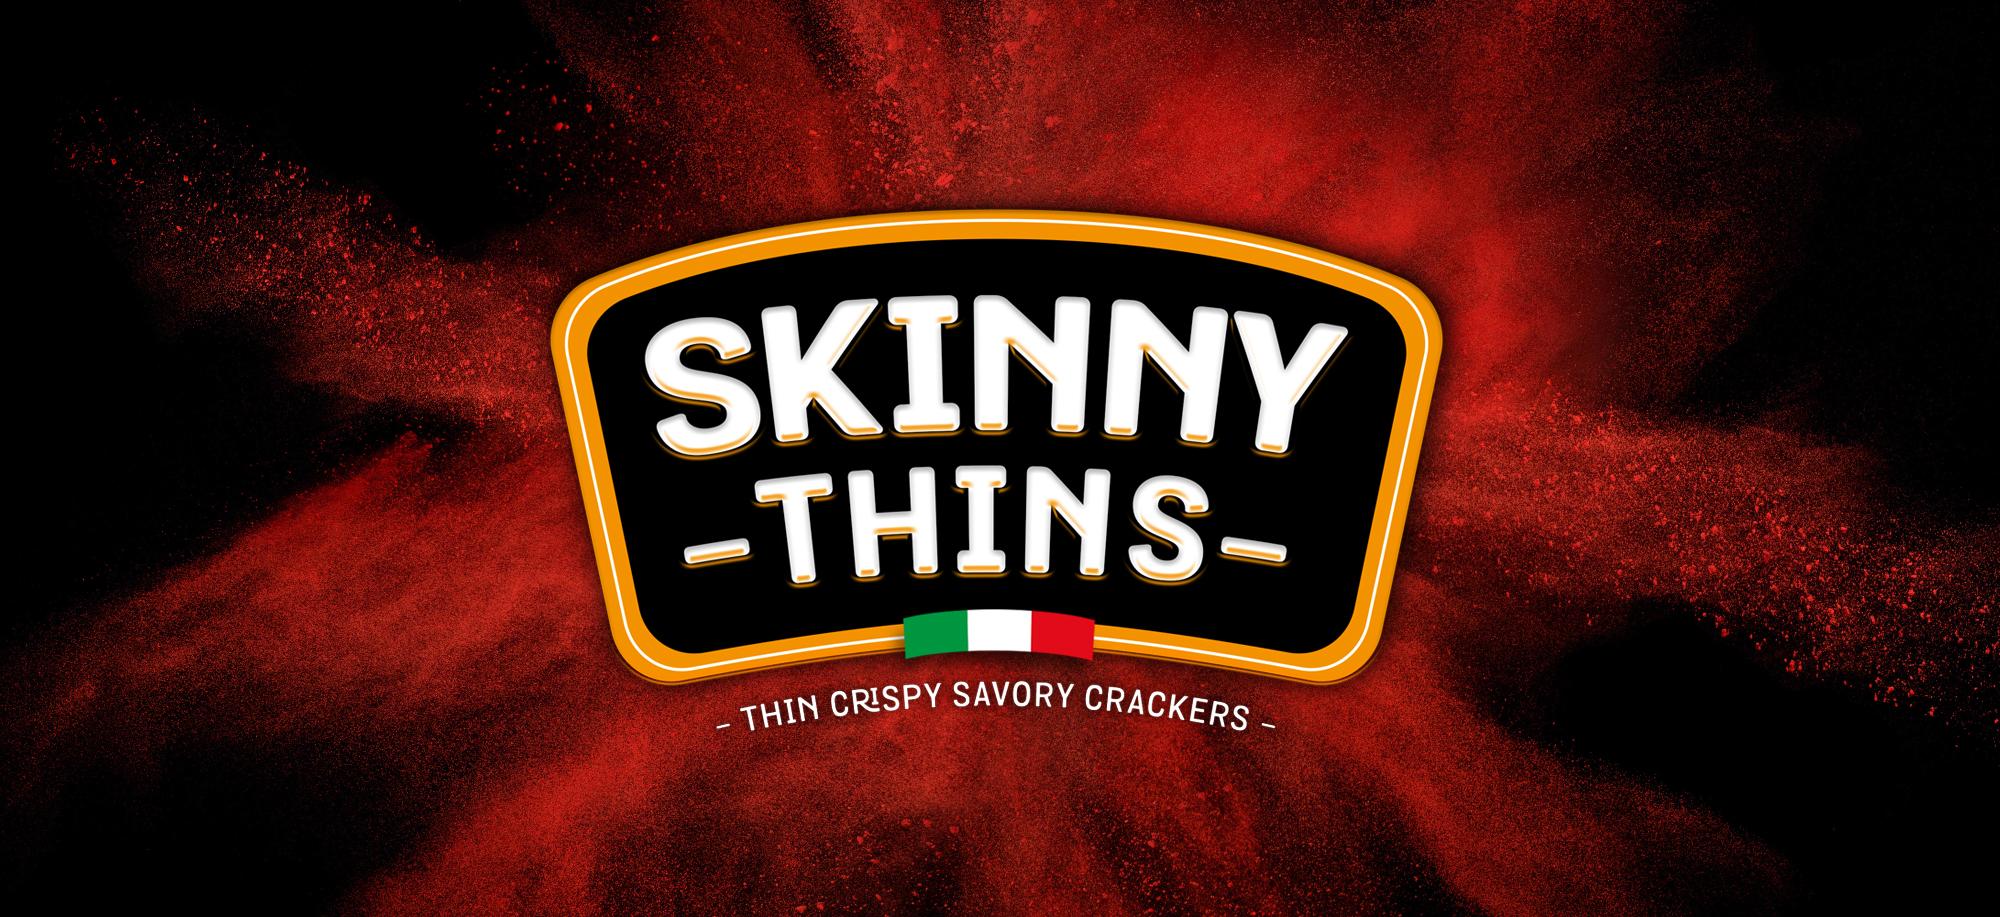 Skinny Thins